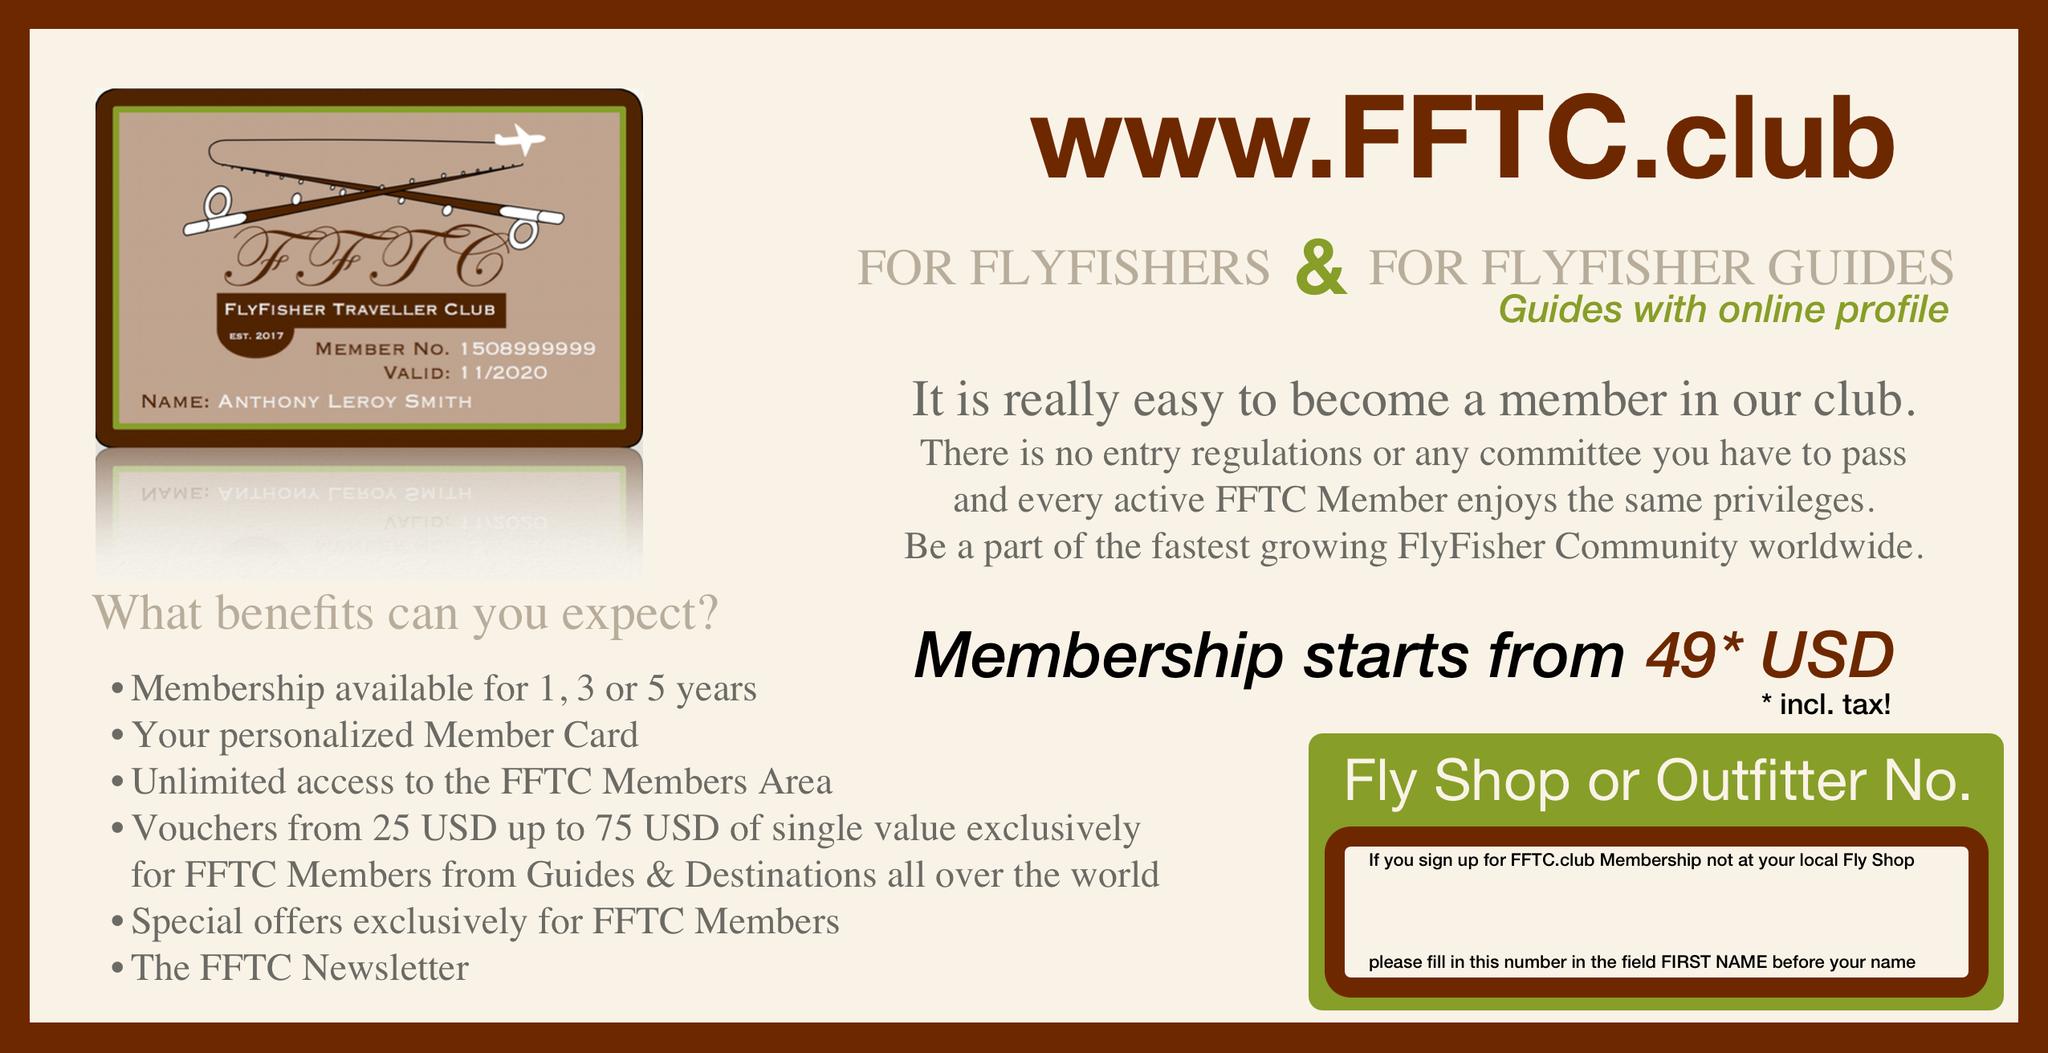 FFTC.club - Fly Fisher Membership - Backside Flyer 2017!